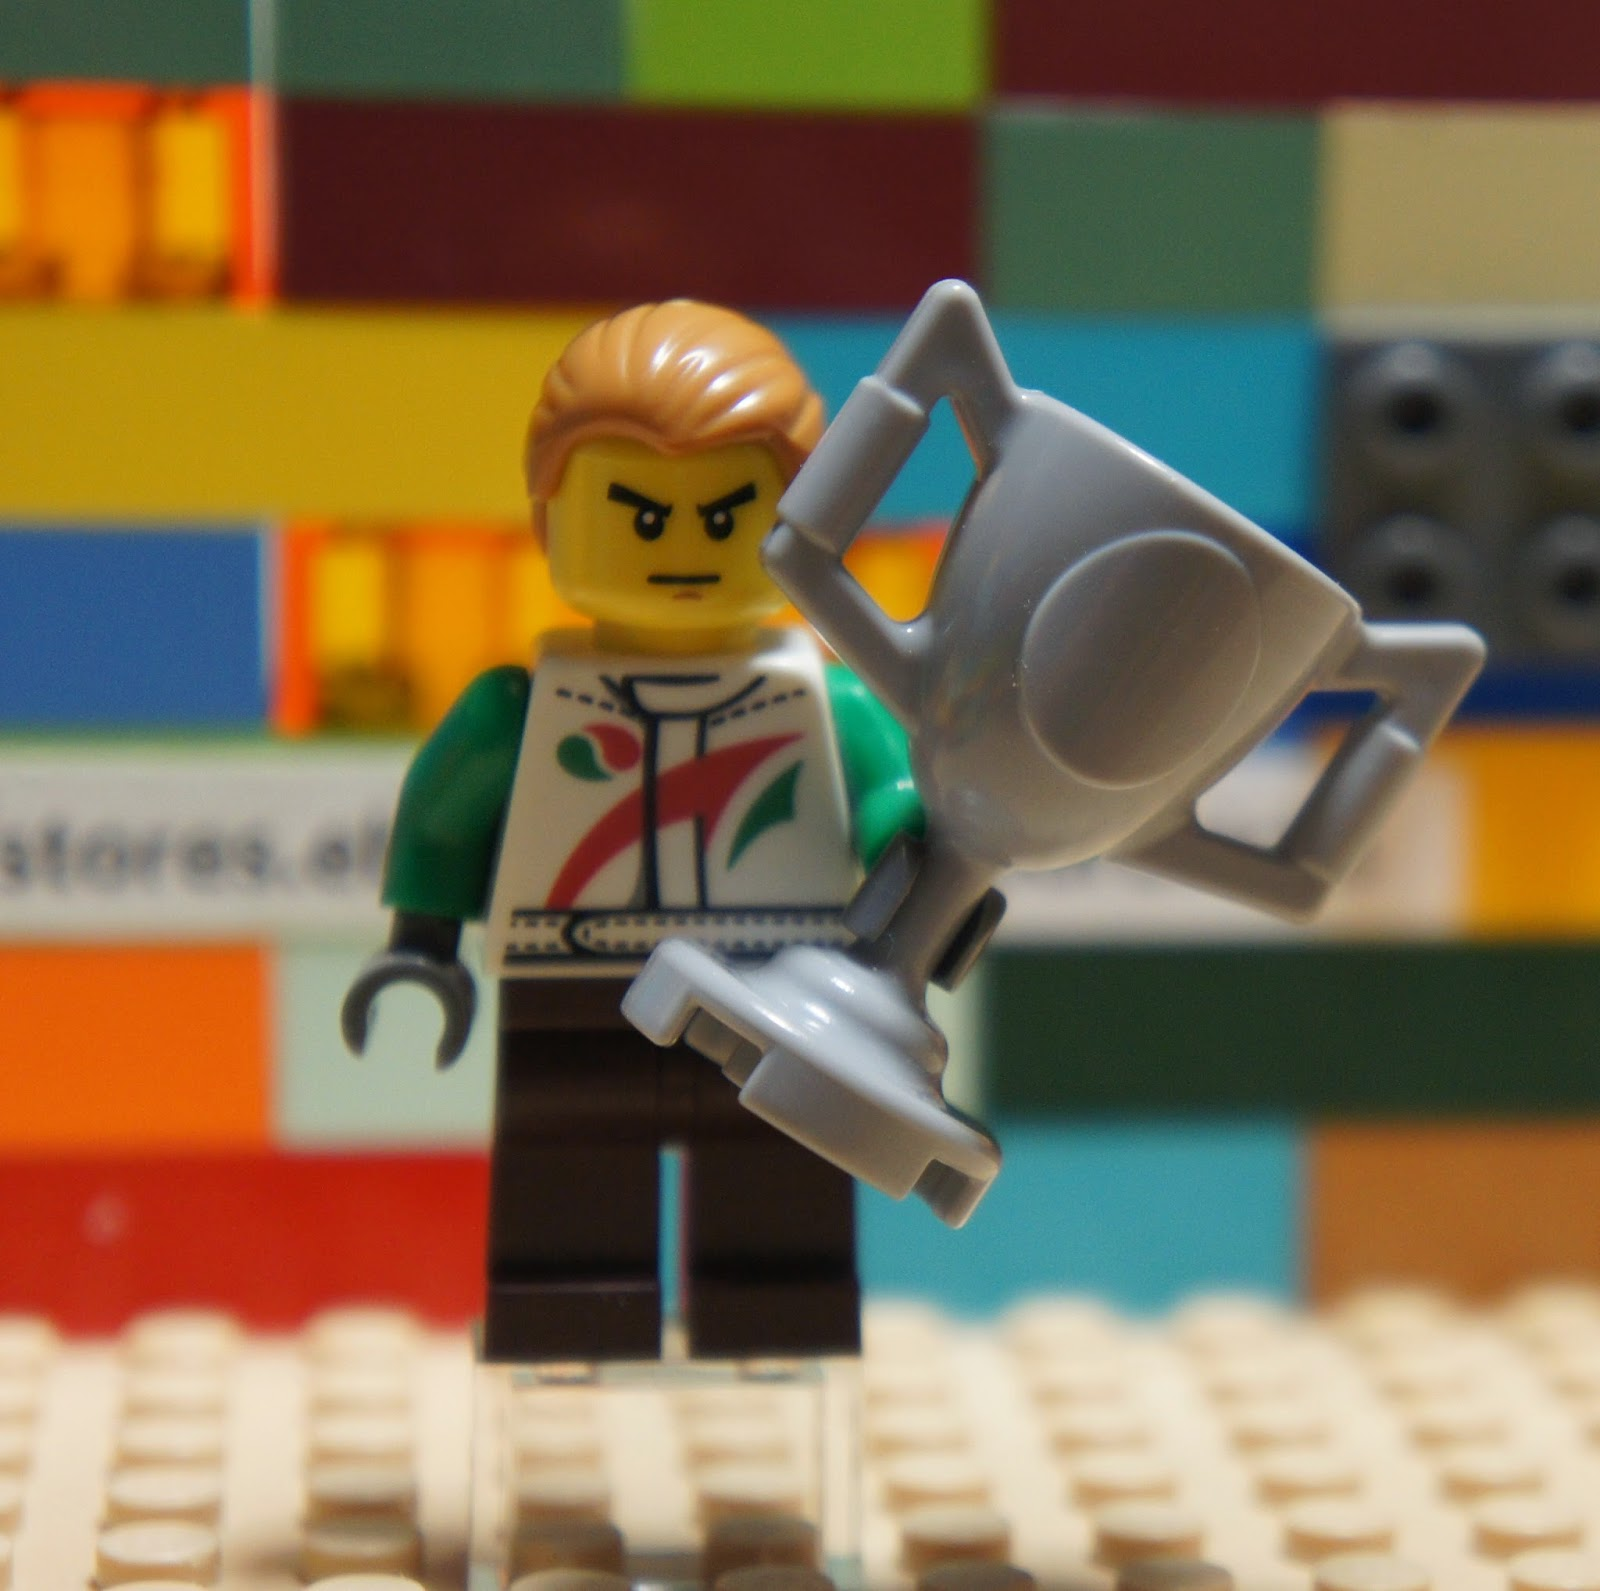 Big Trophy LEGO City TEAM OCTAN Champion Racer Soccer Hockey Player Minifigure